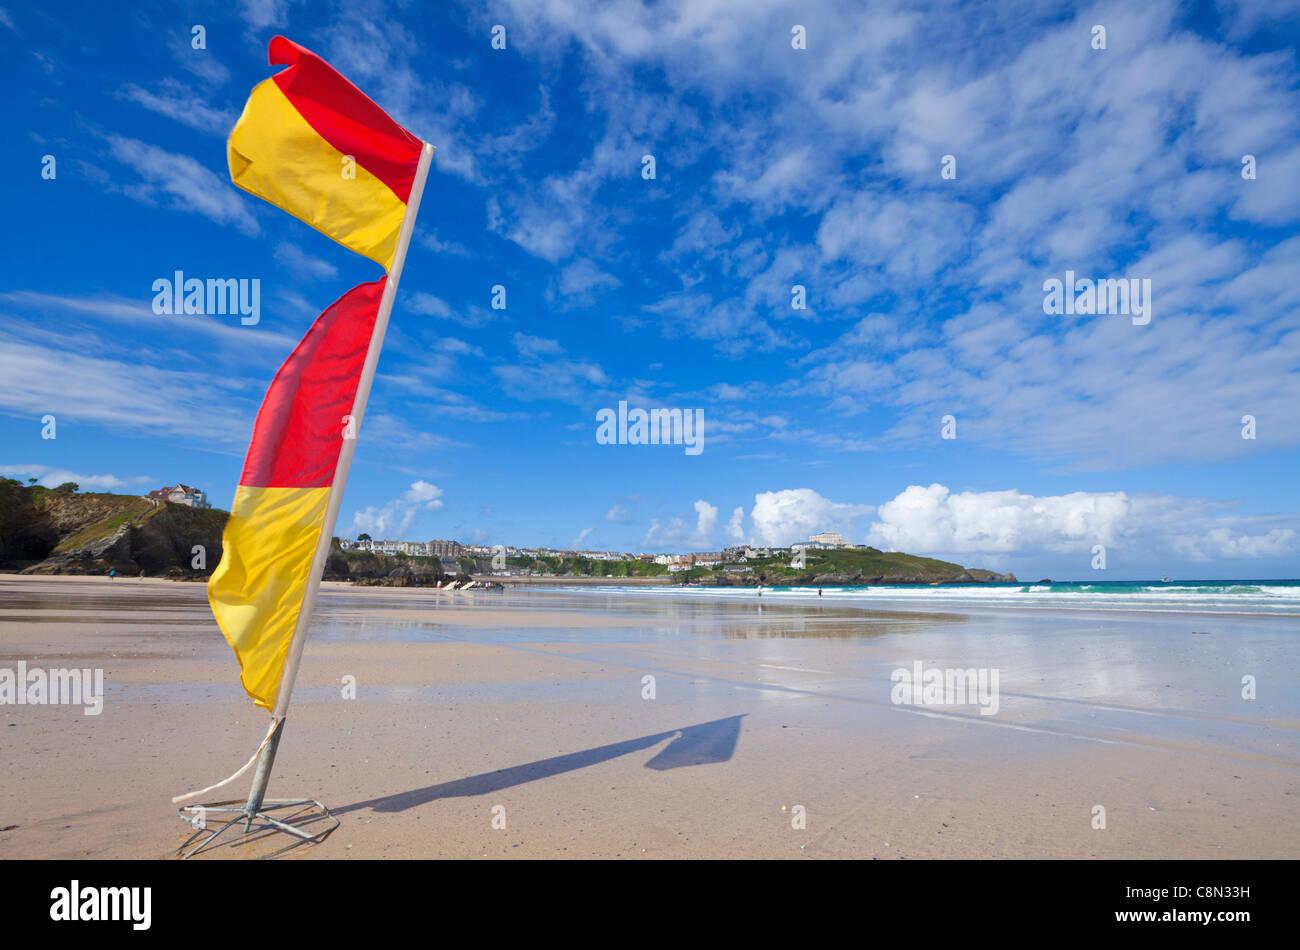 Summer, Lifeguard Warning Flags, Empty Newquay Beach, Cornwall, GB, UK, EU, Europe - Stock Image